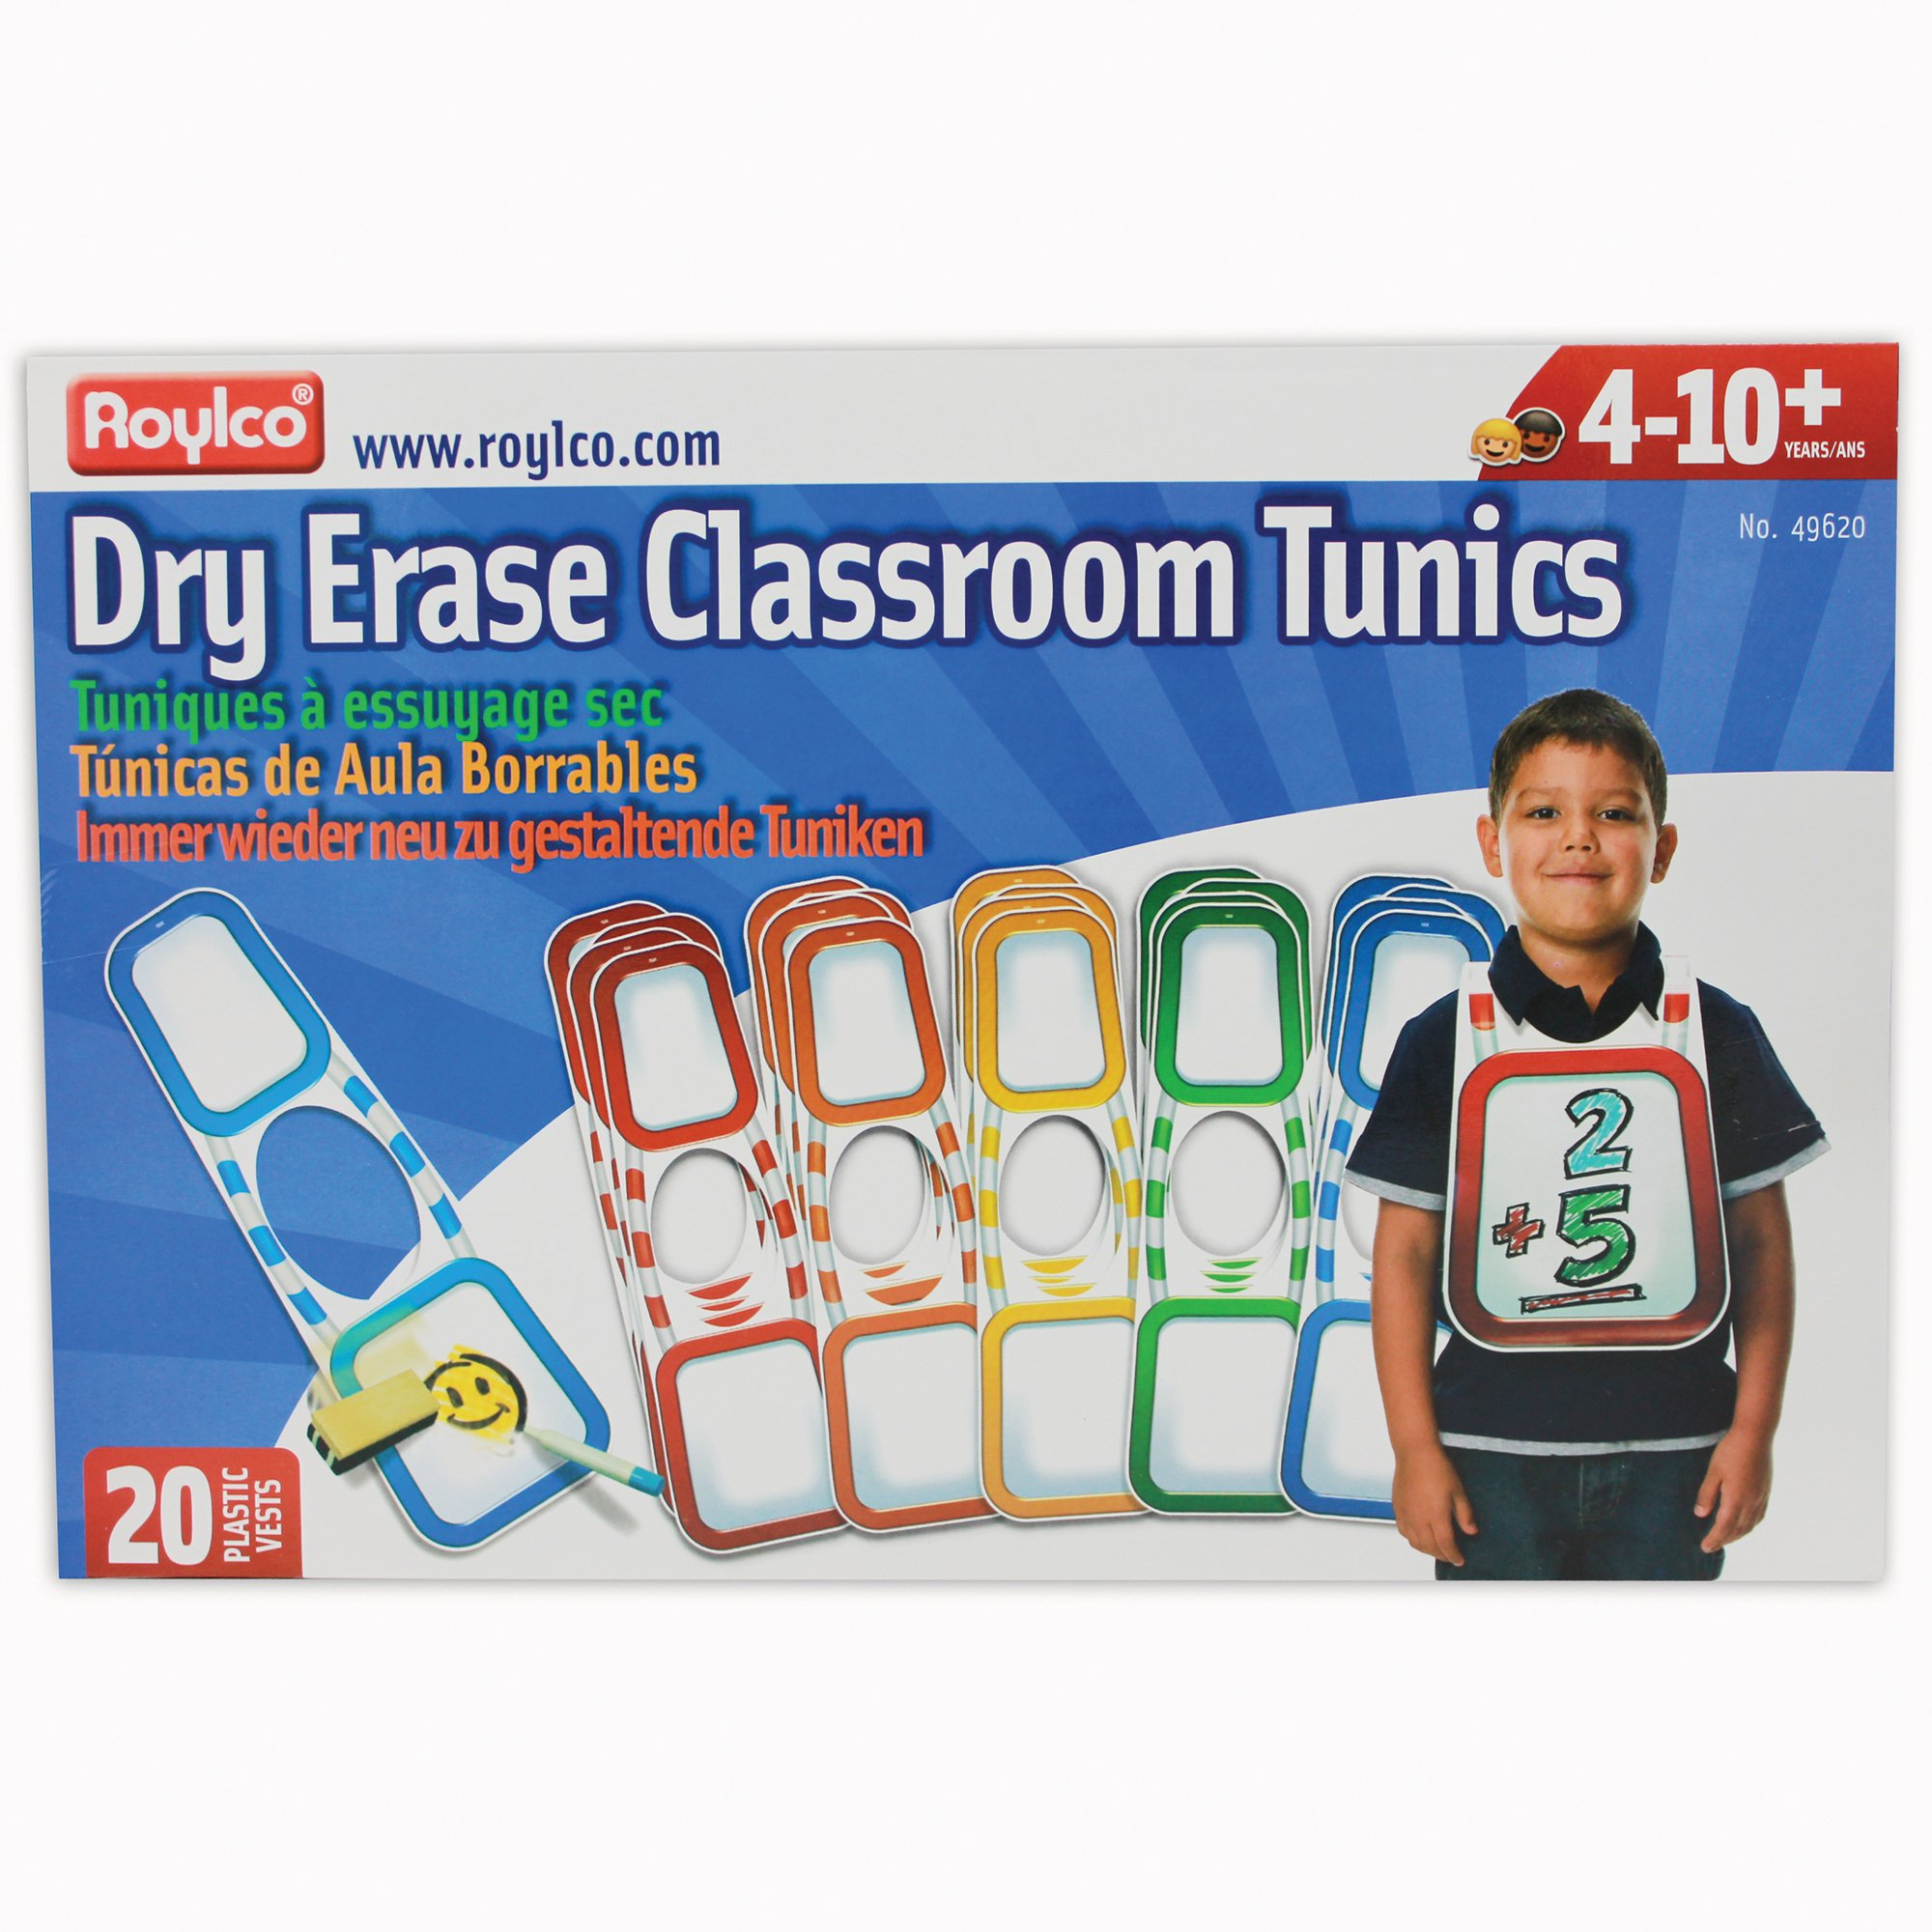 Roylco R49620 Dry Erase Classroom Tunics